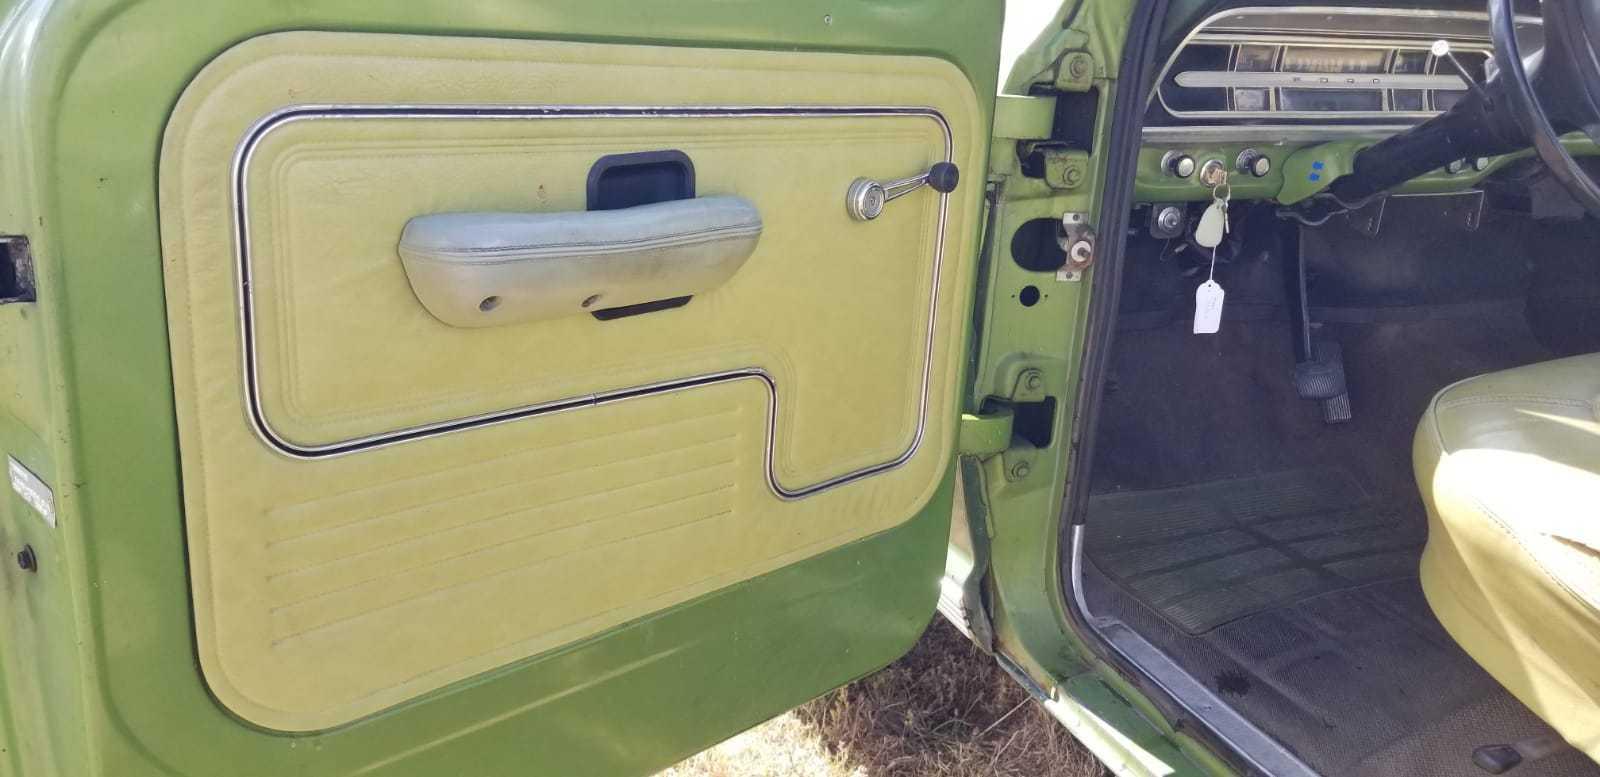 1972-Ford-F250-Camper-Special-Explorer-360ci-V8-12